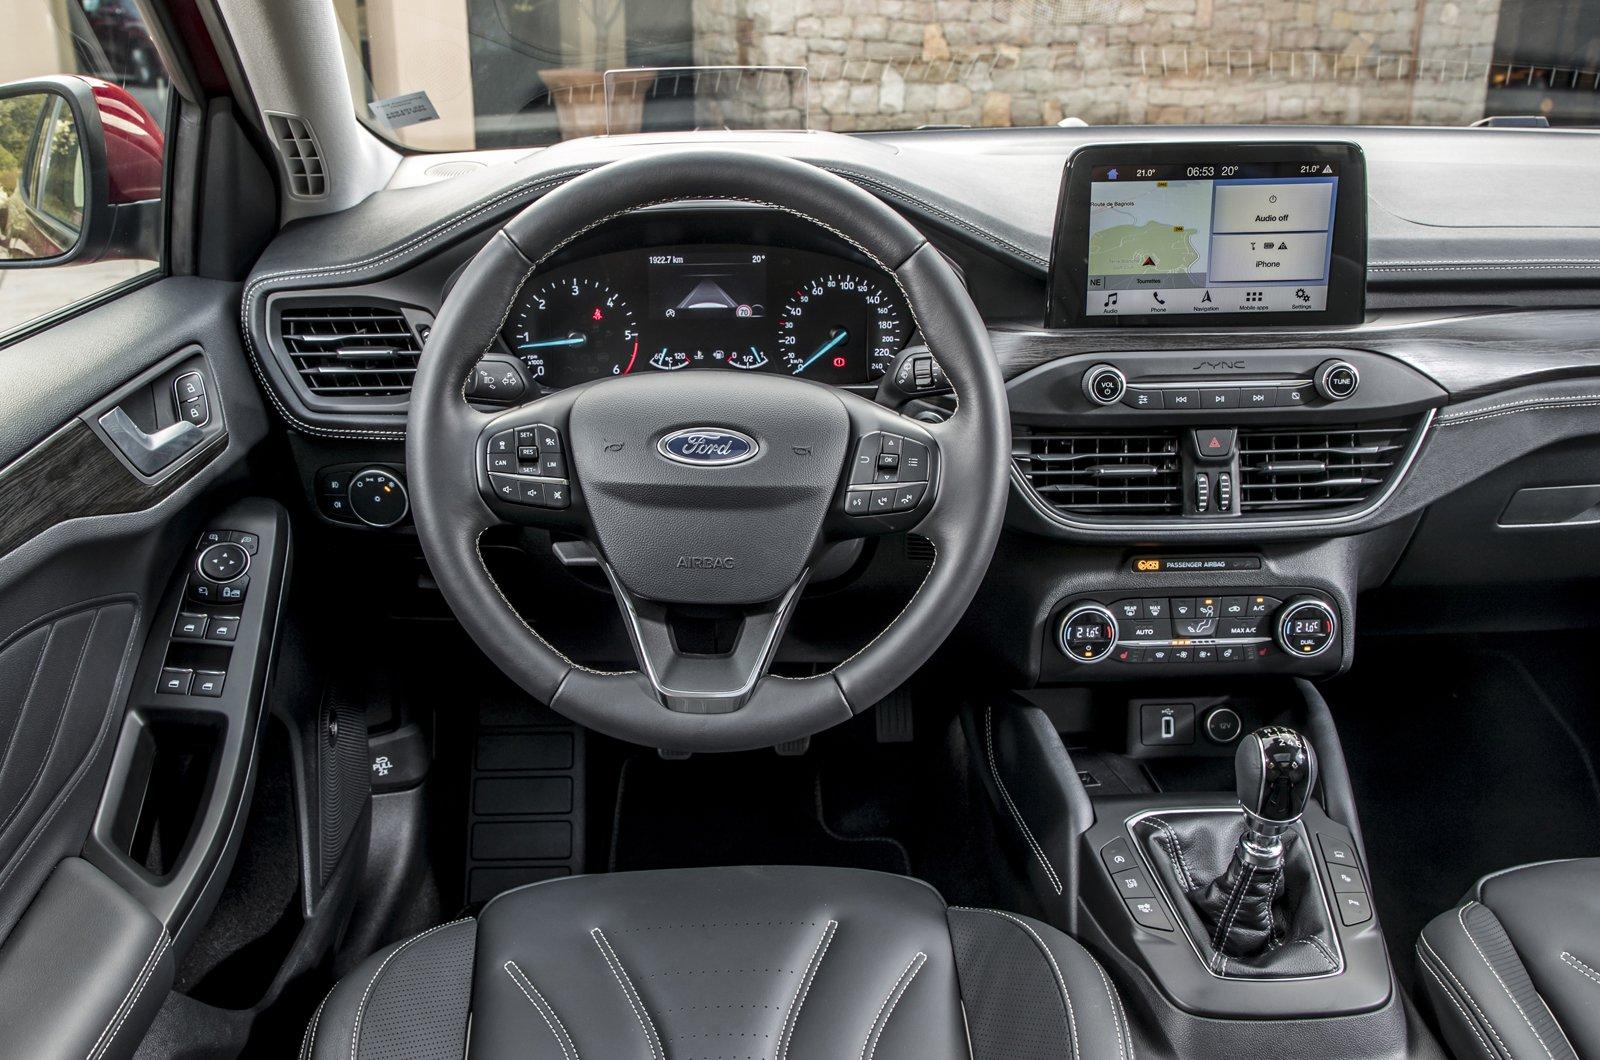 Ford Focus Estate dashboard